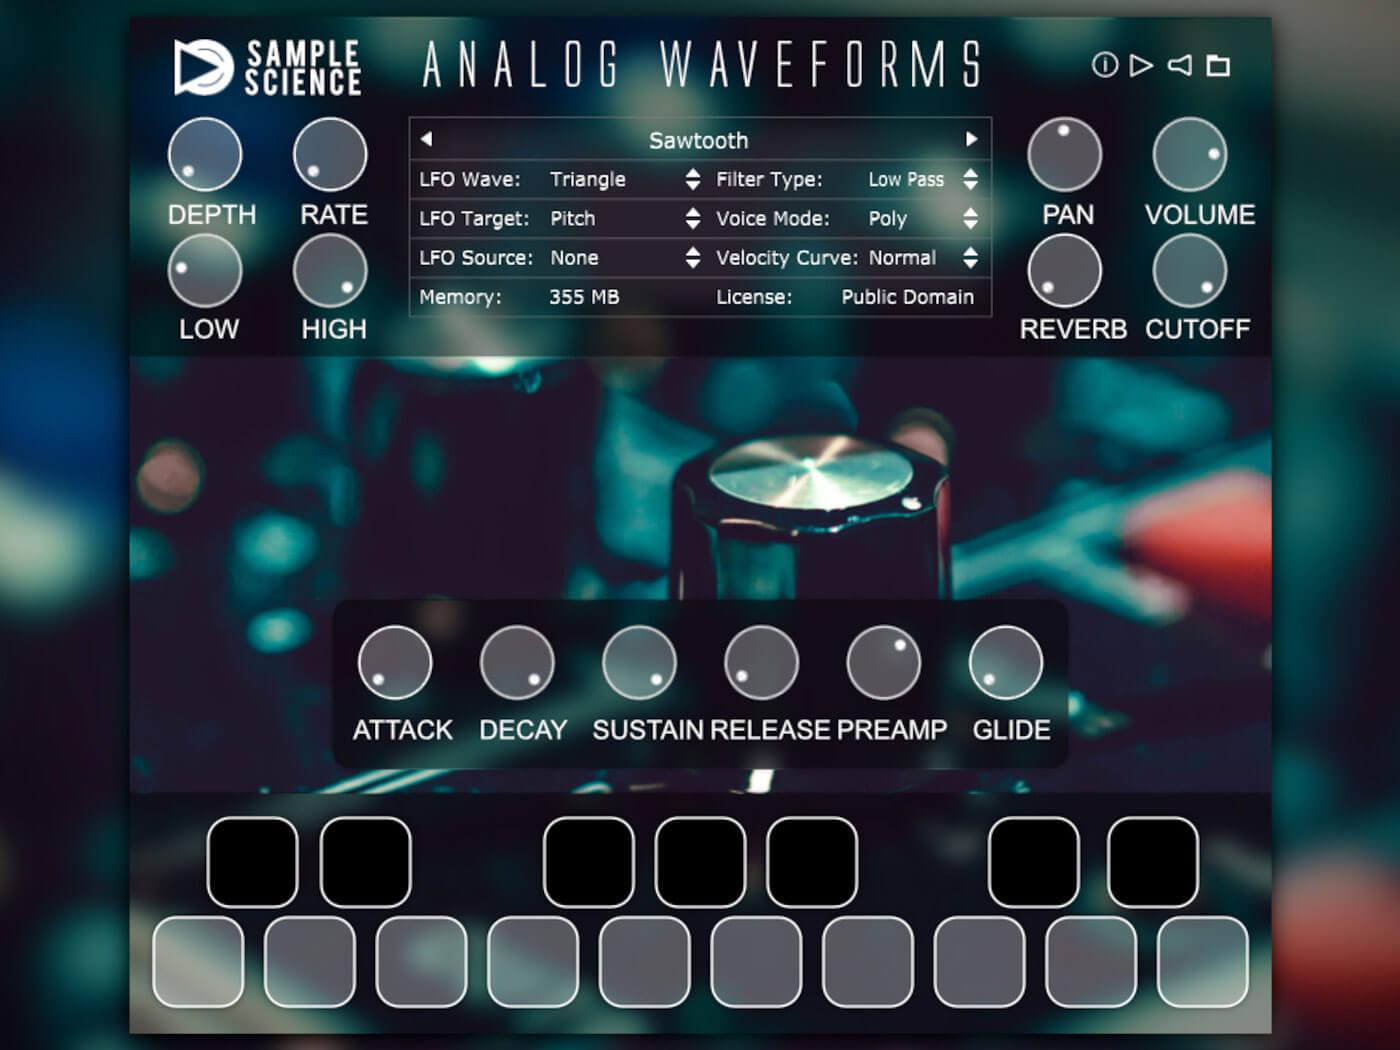 SampleScience AnalogWaveforms